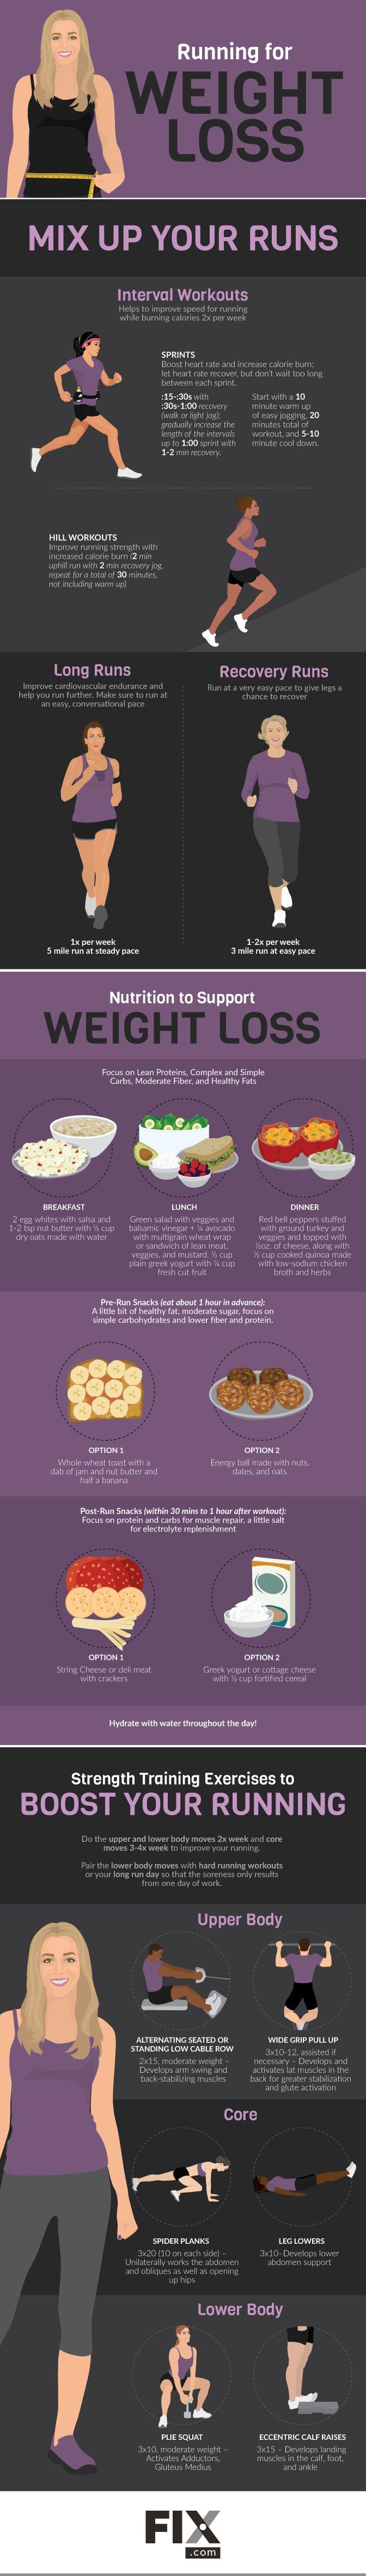 Diet pills ruin your metabolism photo 3